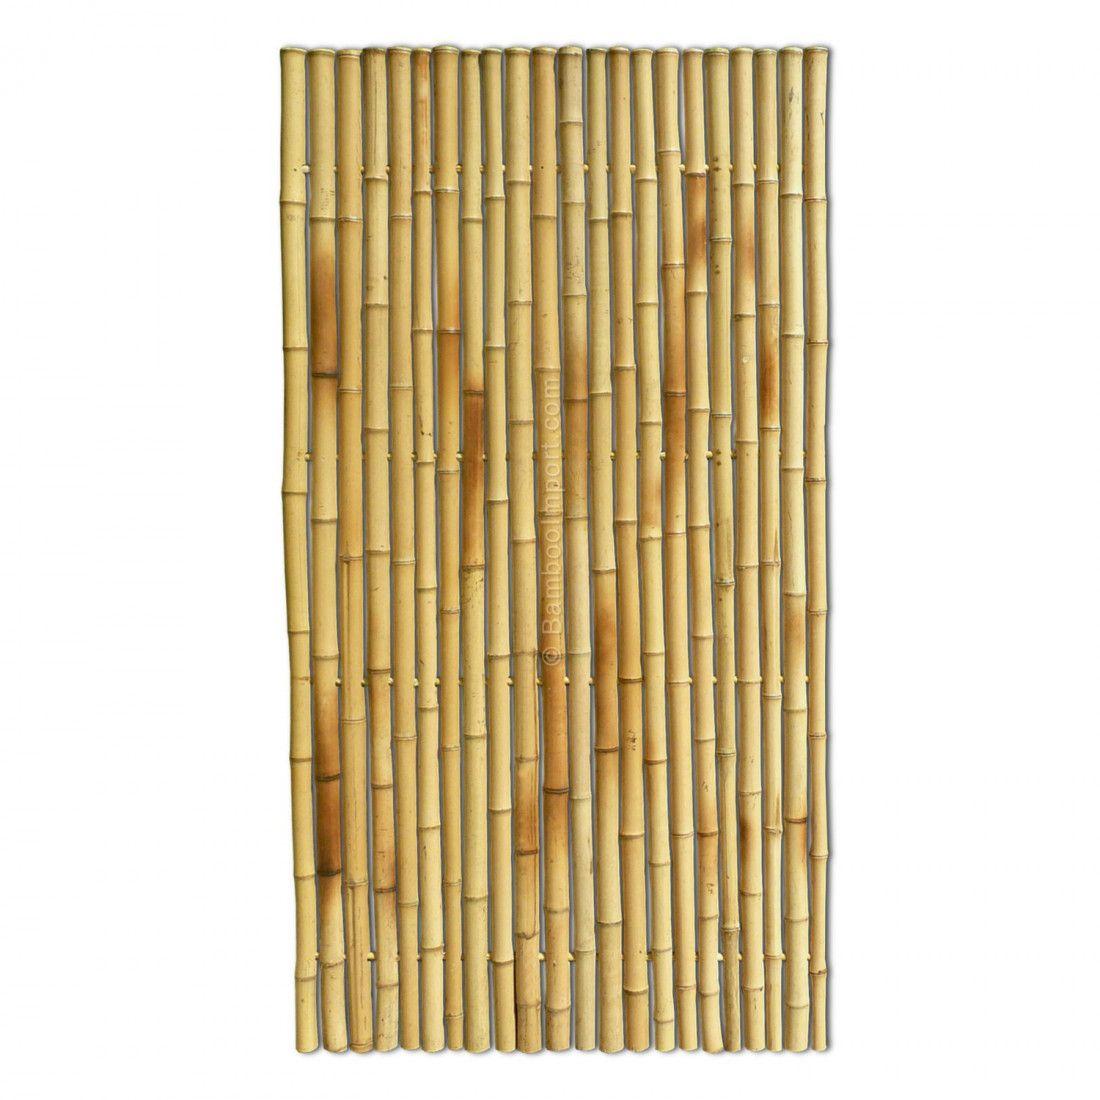 Bamboo Fence Panel Trendline 90 x 180 cm Bamboo fence